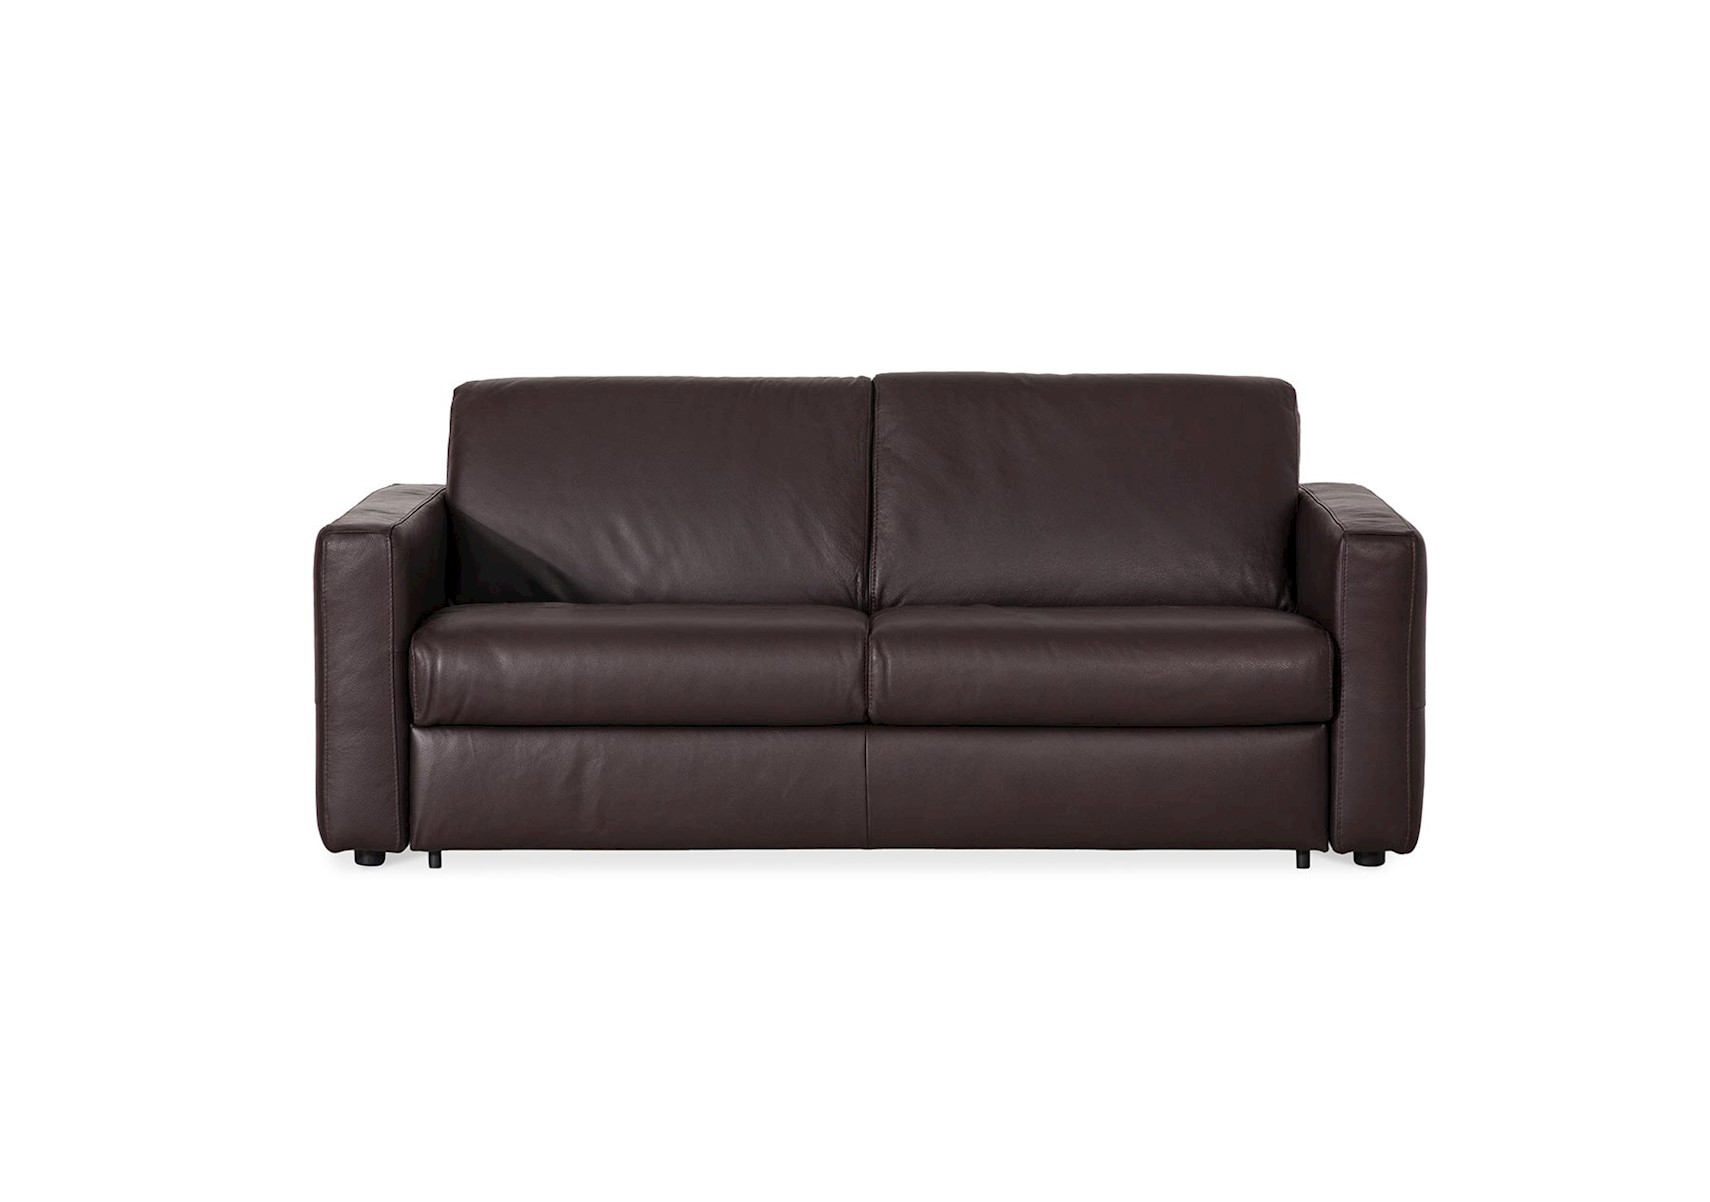 Lacks Modena Leather Sleeper Sofa ~ Brown Leather Sleeper Sofa